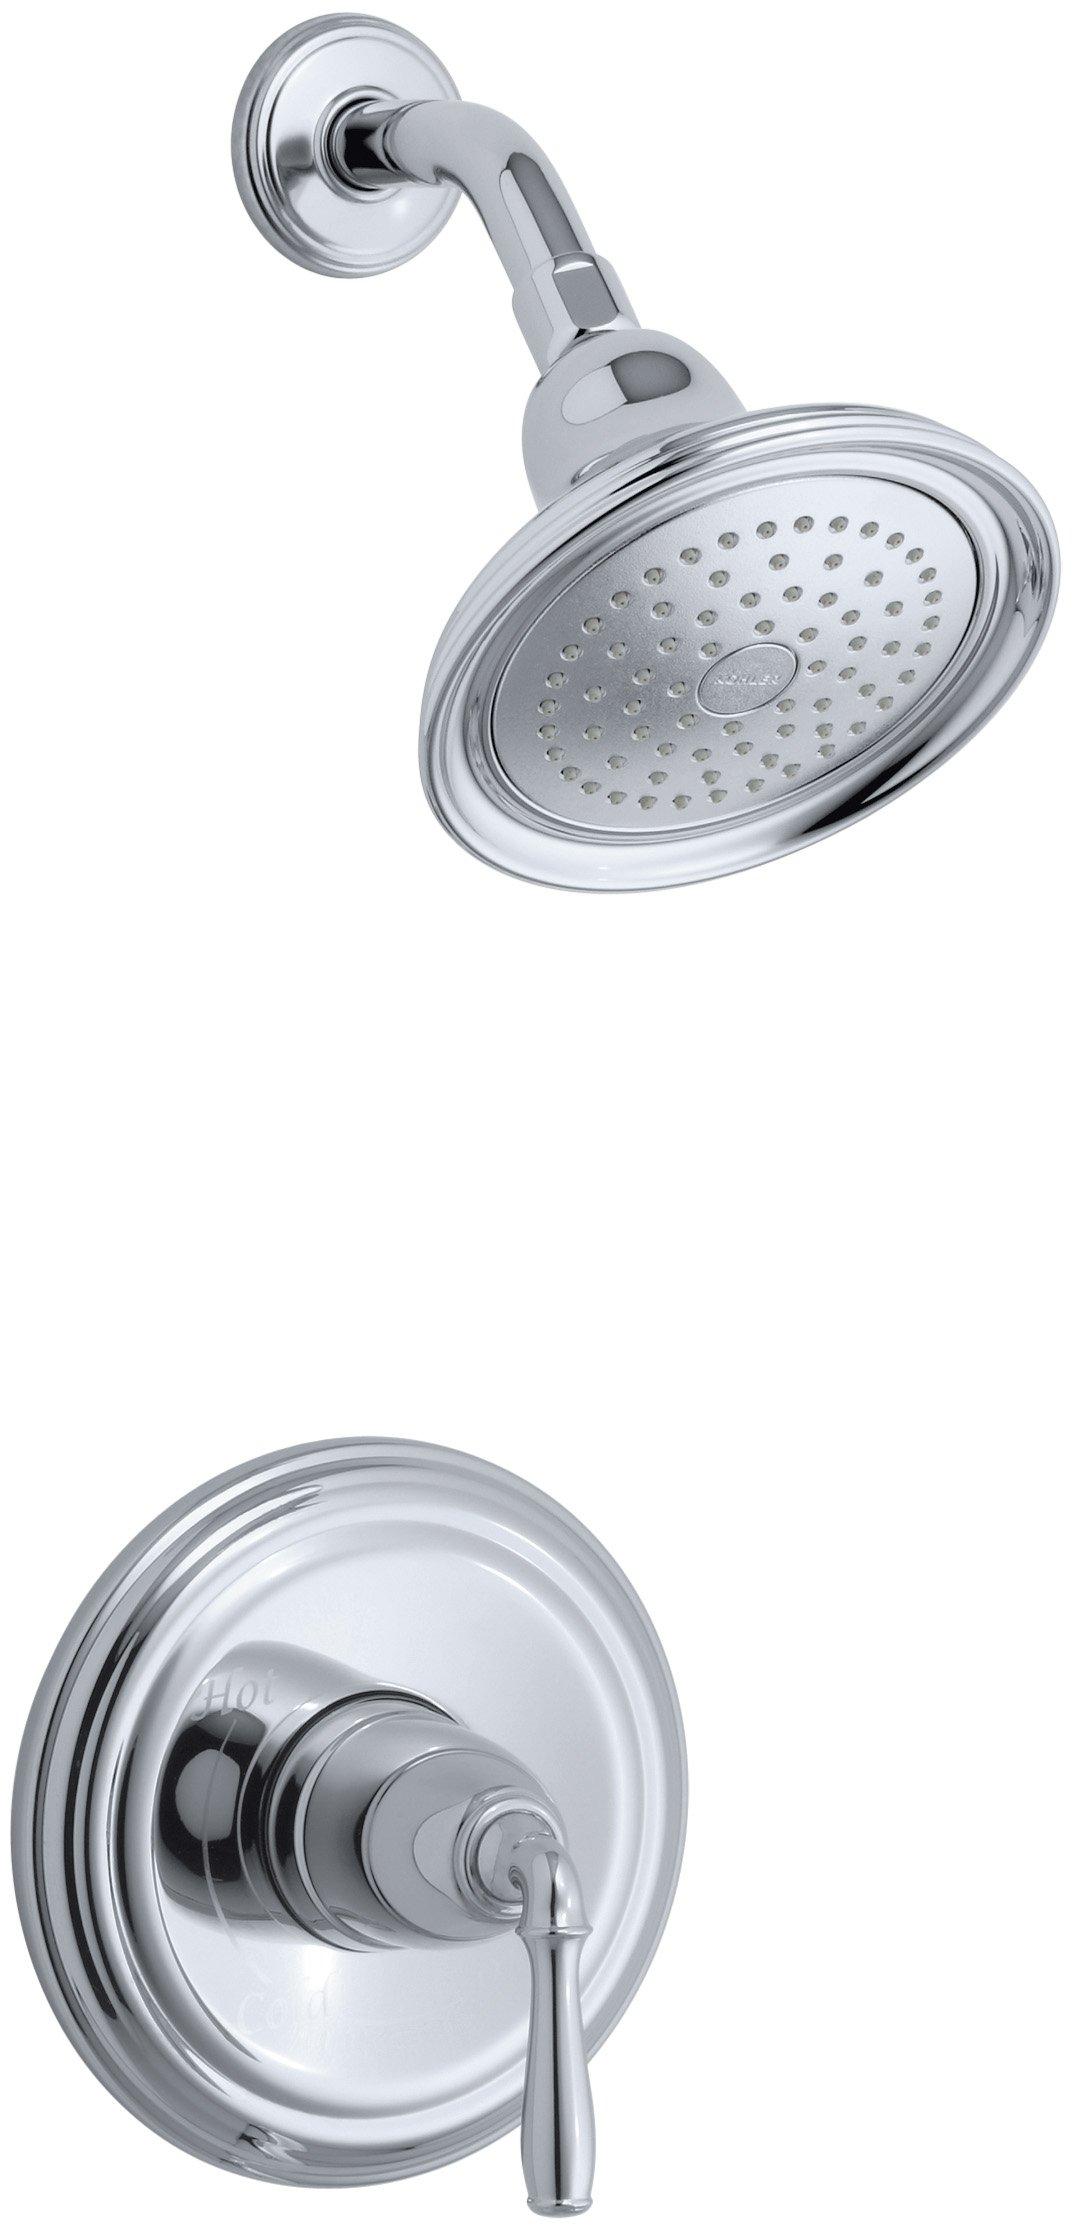 Cheap Kohler Shower Faucet Parts Find Kohler Shower Faucet